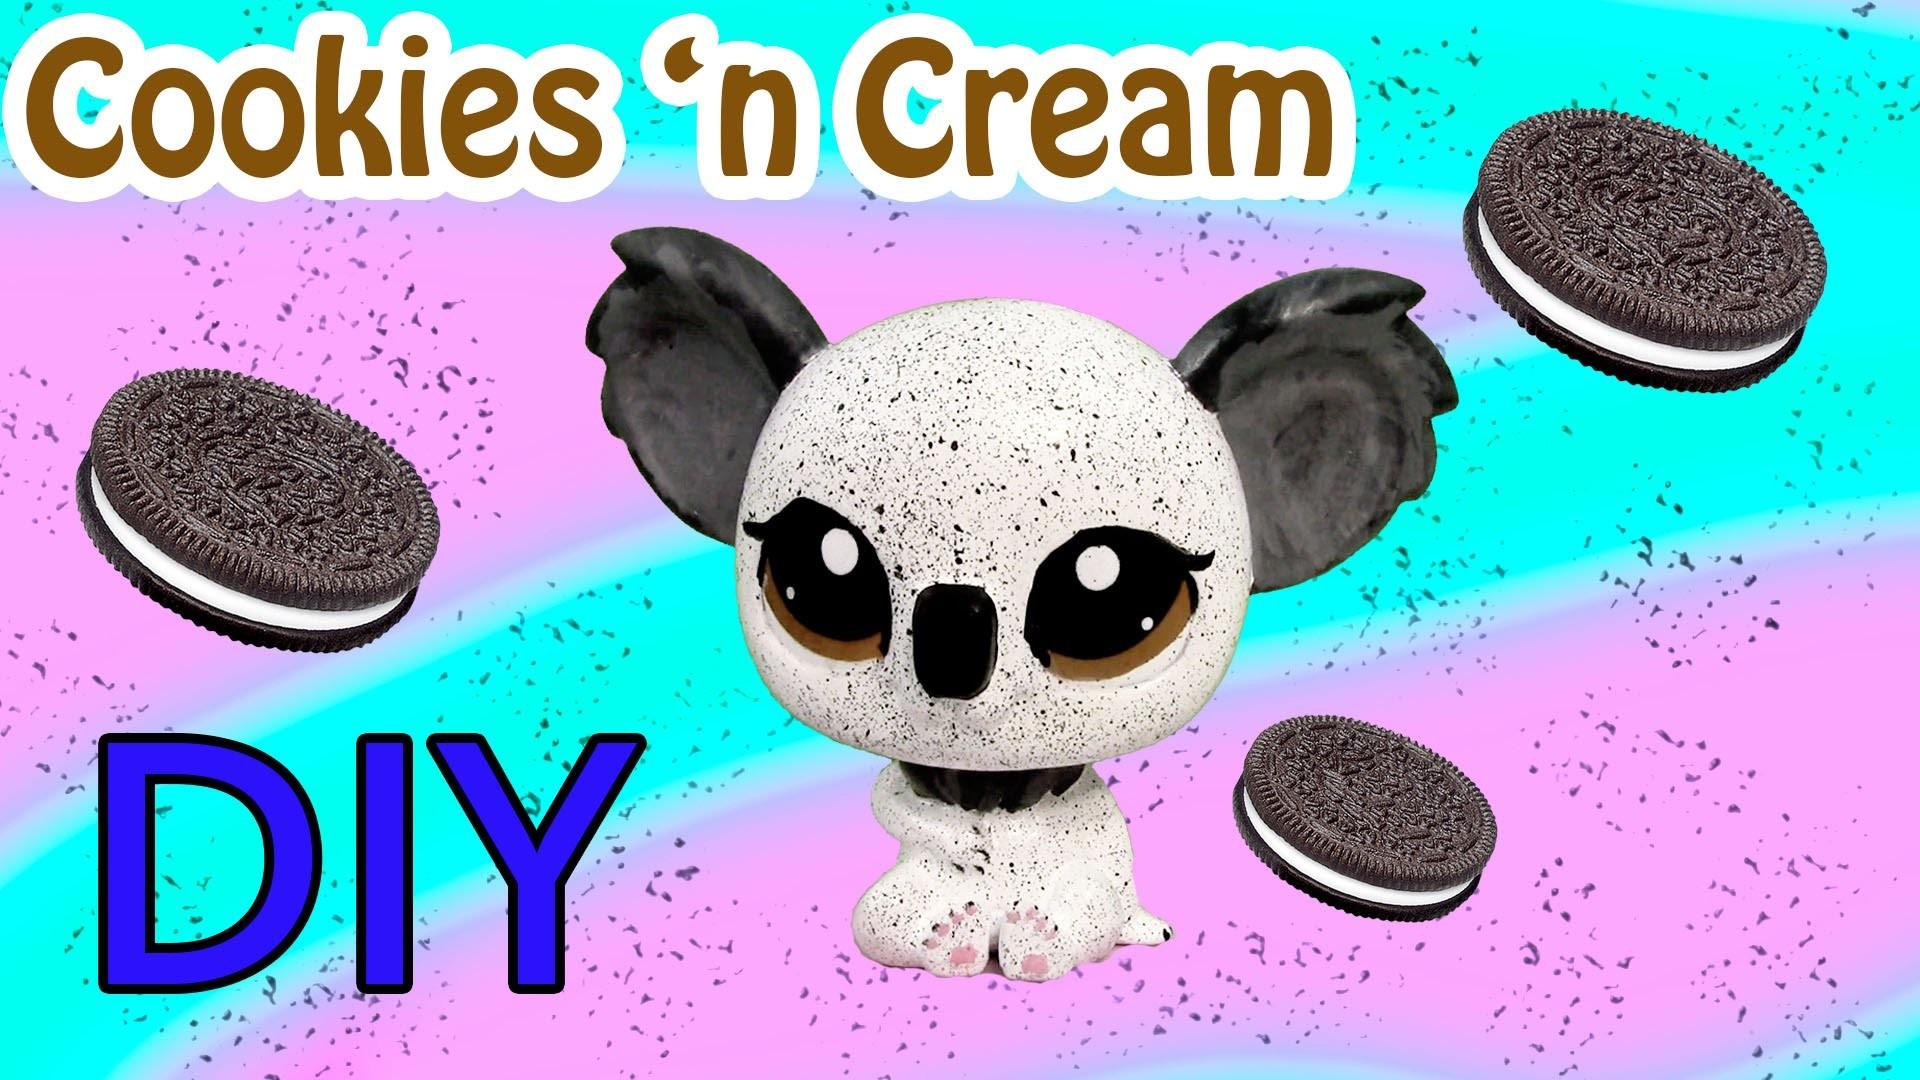 Custom LPS Koala Oreo Cookies And Cream Inspired DIY Littlest Pet Shop